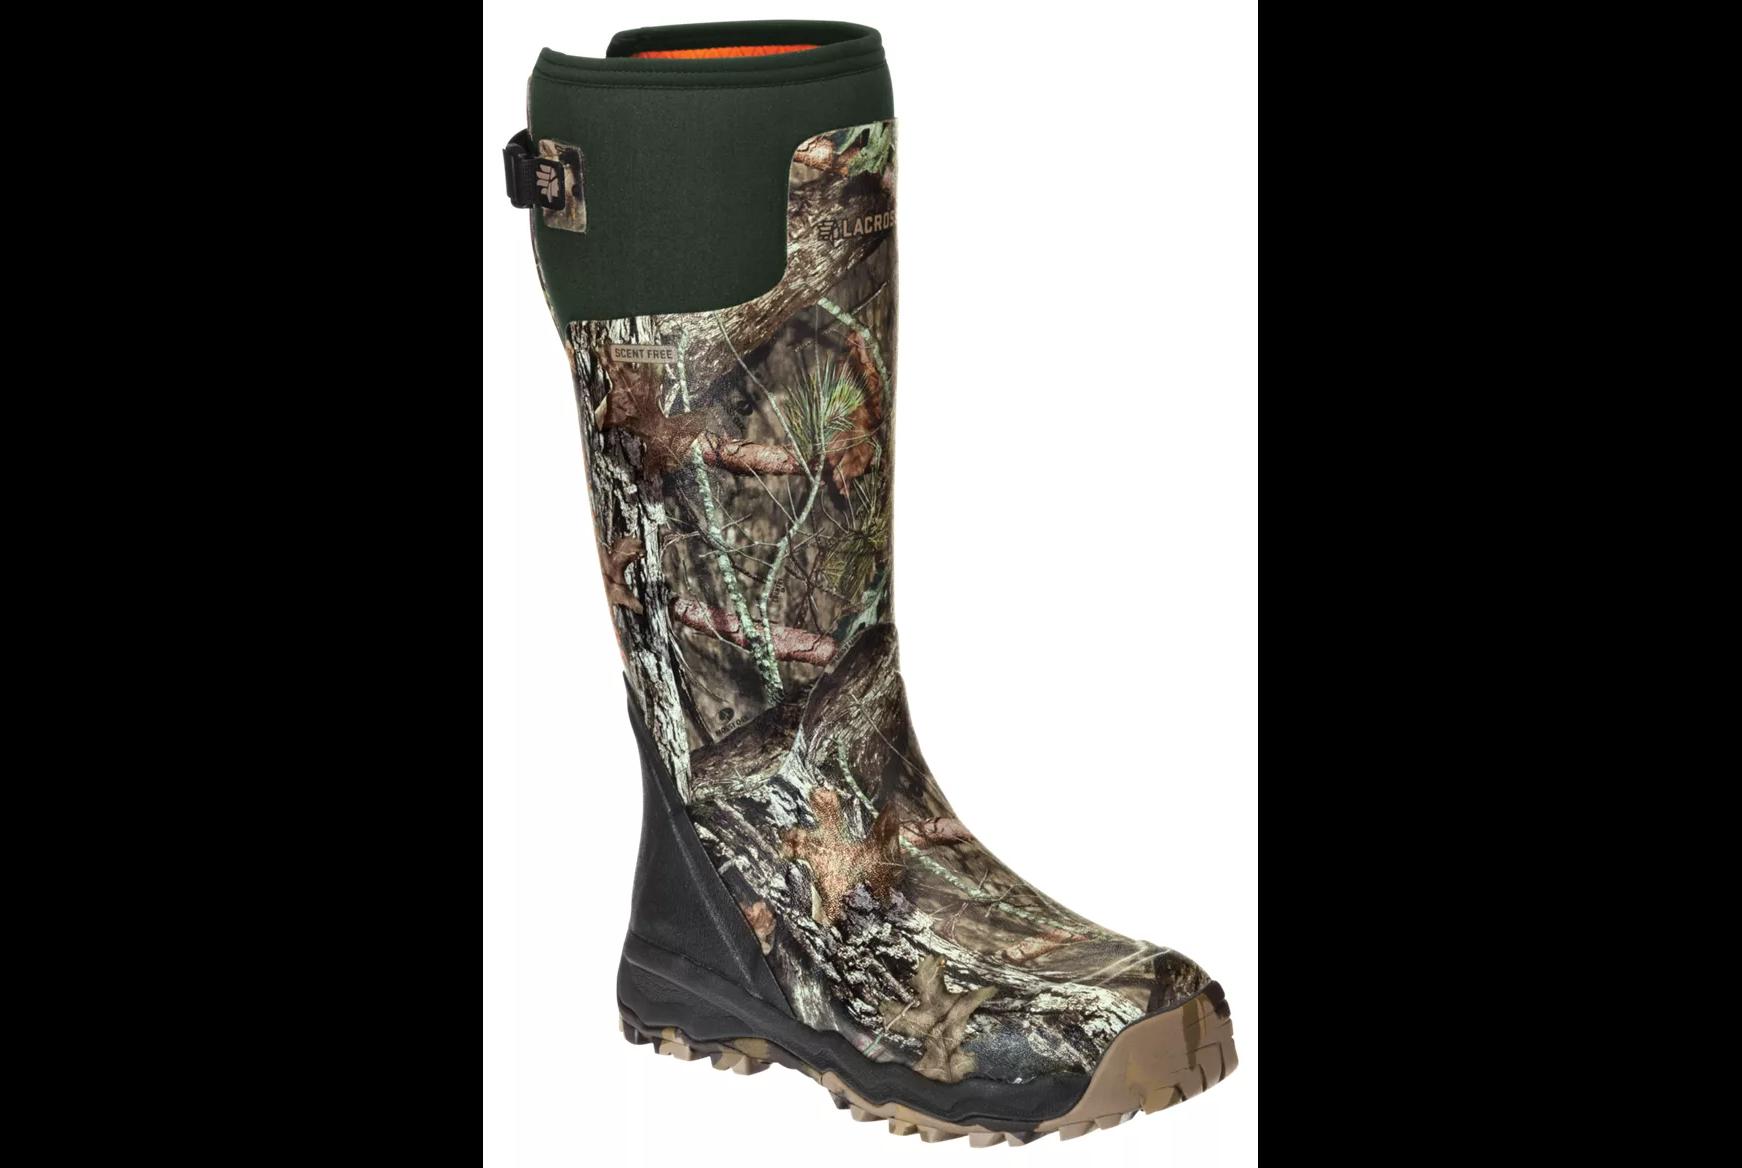 best price on lacrosse alphaburly pro boots